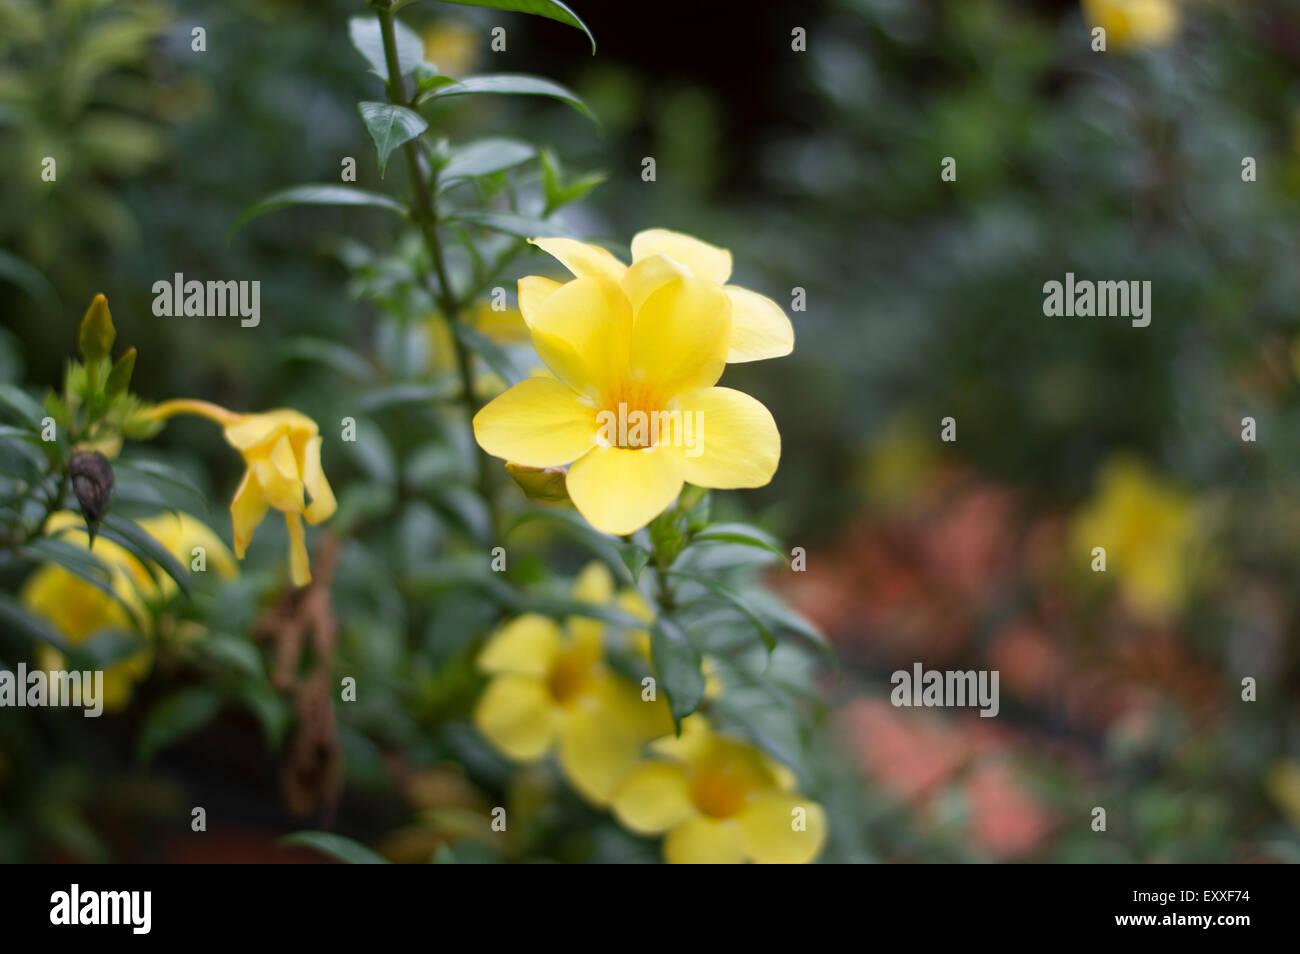 Yellow bell flower stock photos yellow bell flower stock images yellow bell flower stock image mightylinksfo